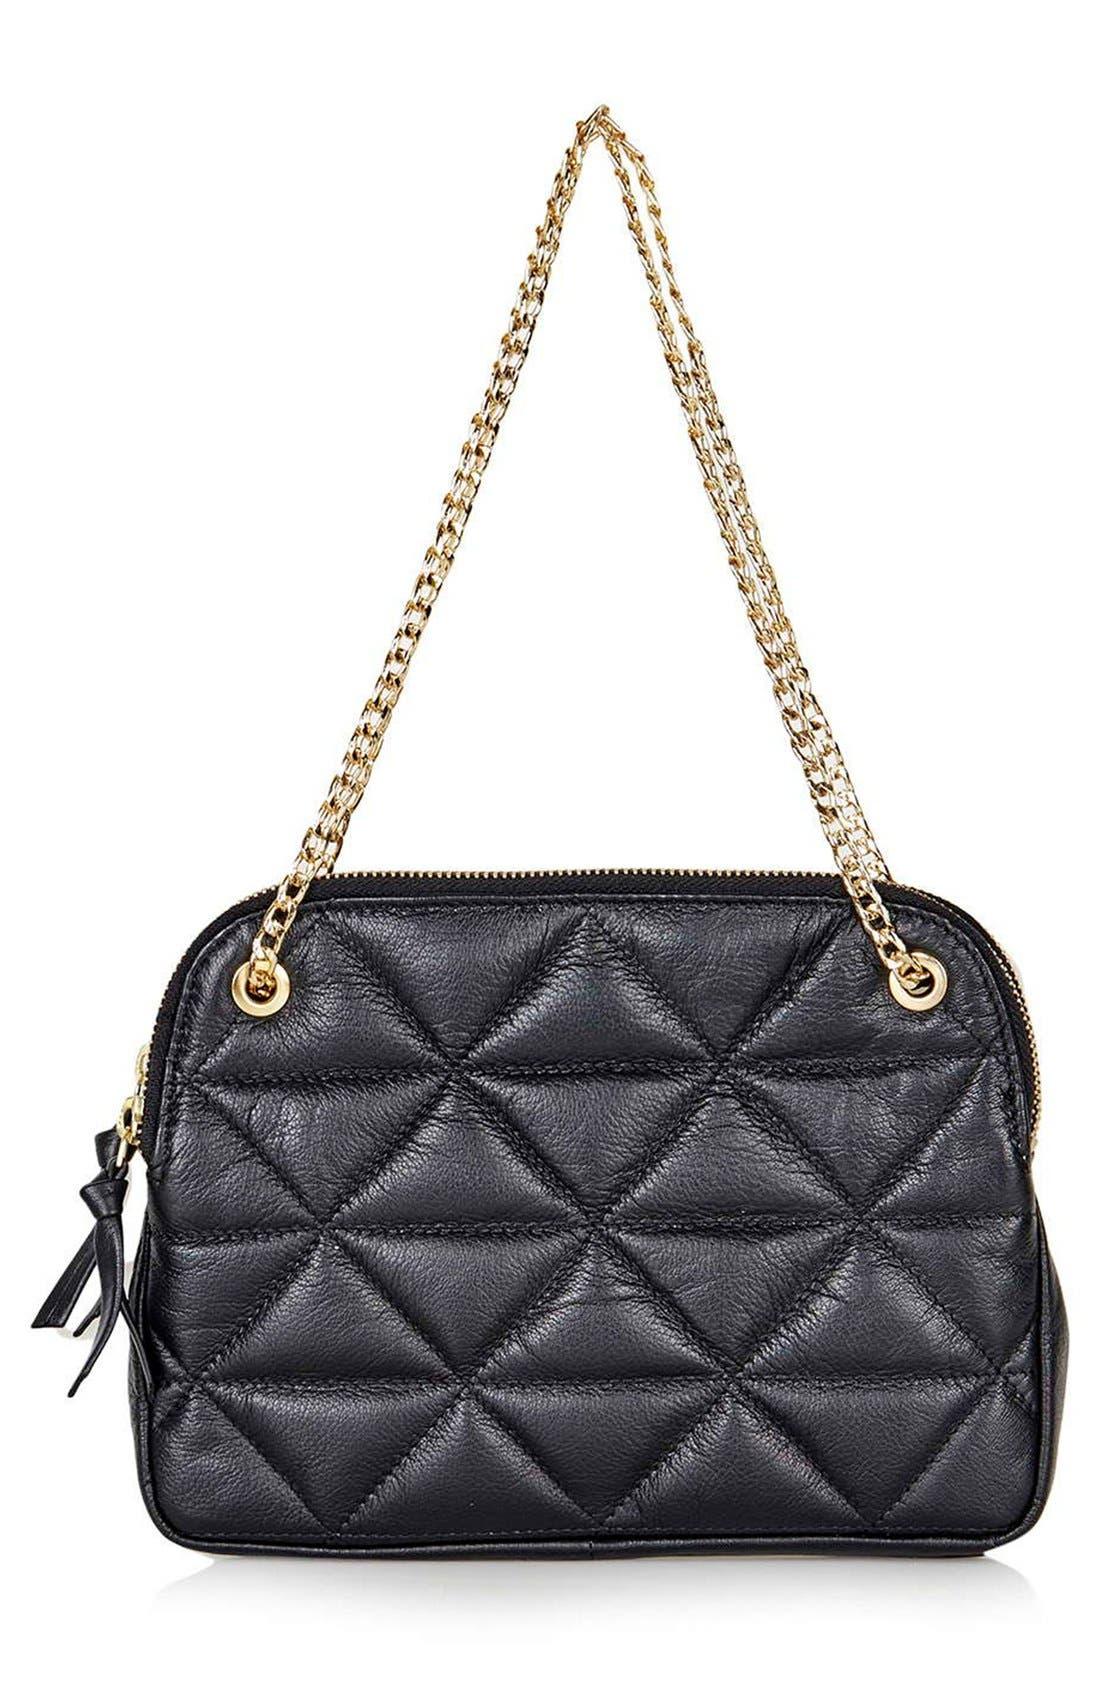 TOPSHOP, Quilted Leather Shoulder Bag, Main thumbnail 1, color, 001